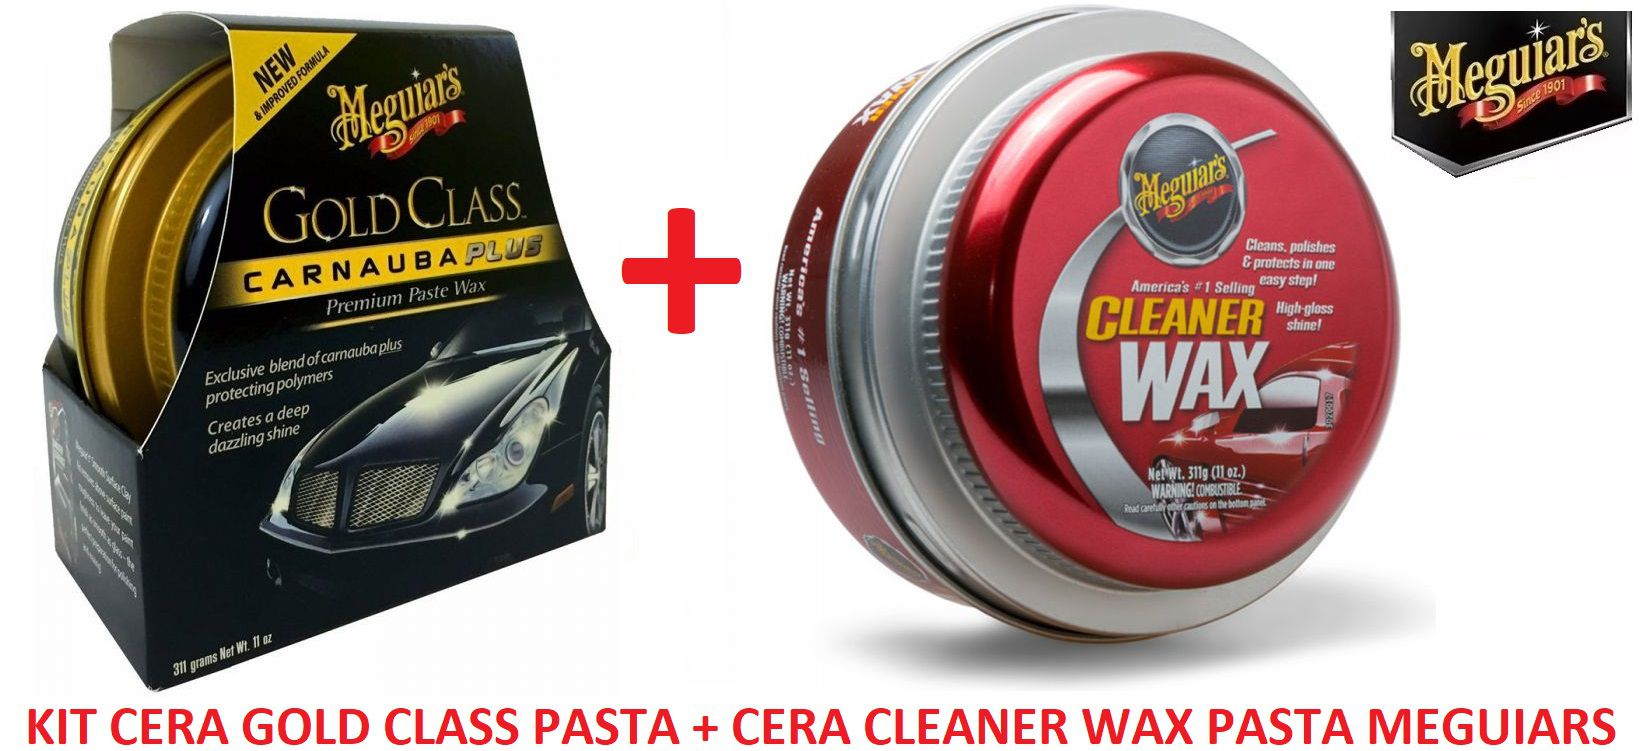 Kit c/ Cera Meguiars Gold Class Pasta Wax G7014  + Cera Meguiars Cleaner Wax Pasta Limpadora A1214 (ref:A1214)